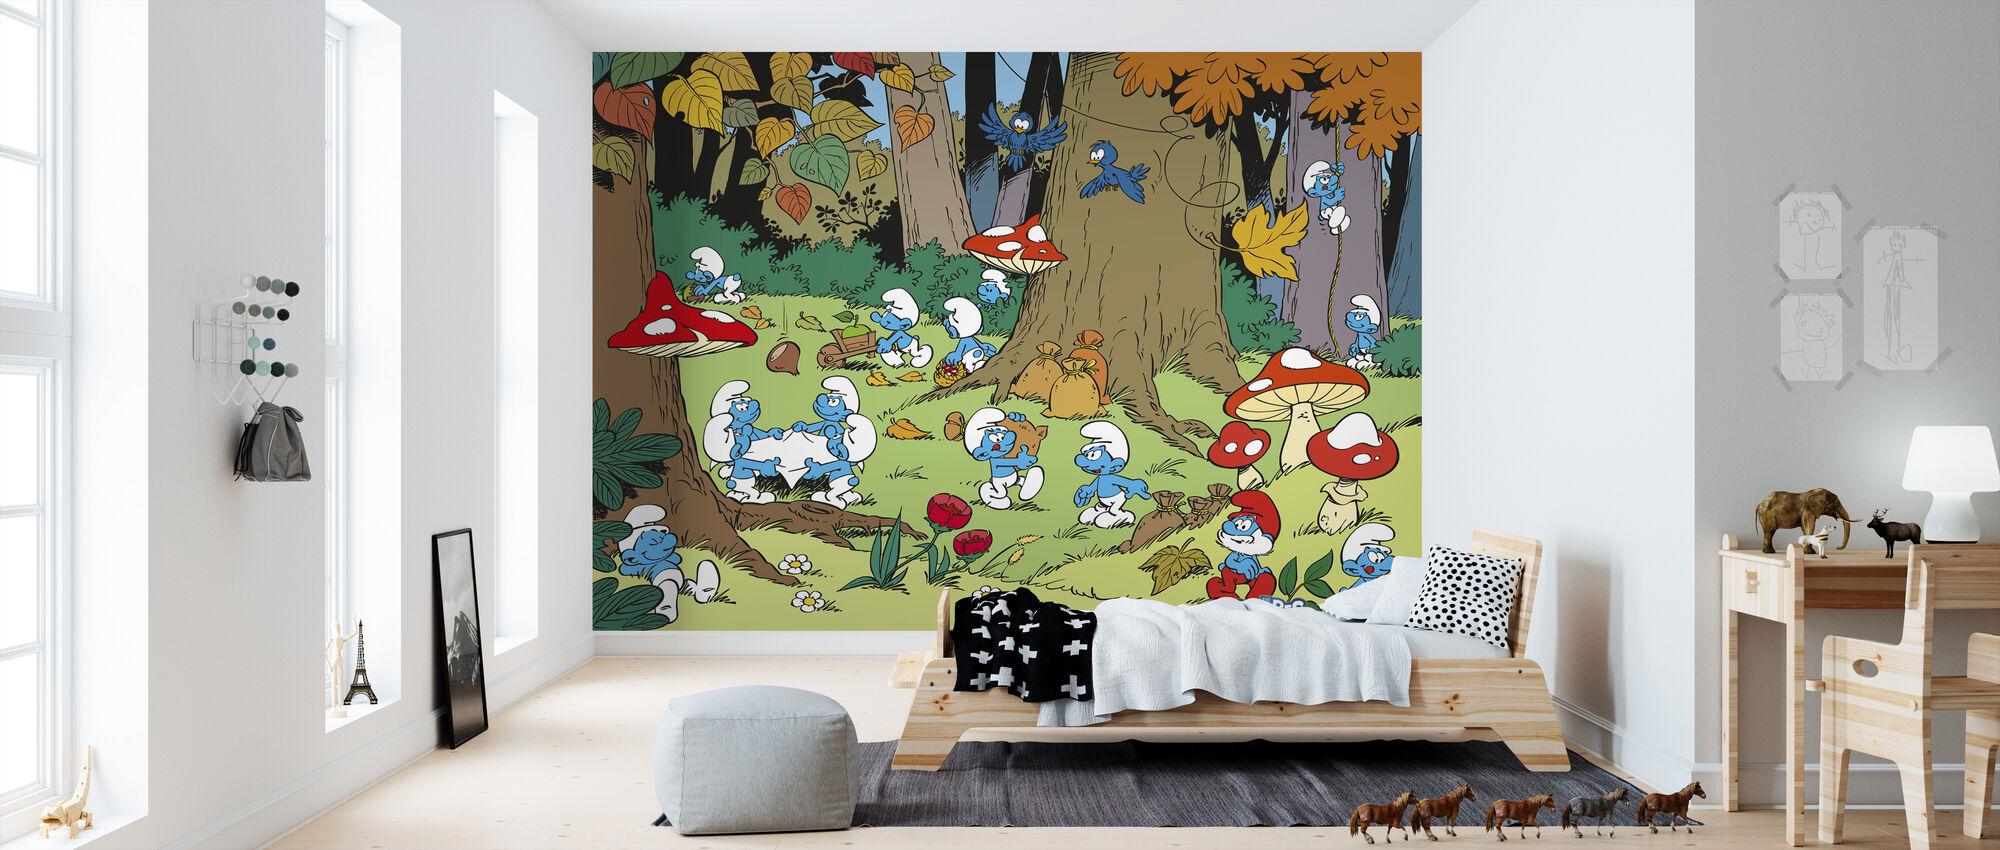 Smurfs - Autumn - Wallpaper - Kids Room